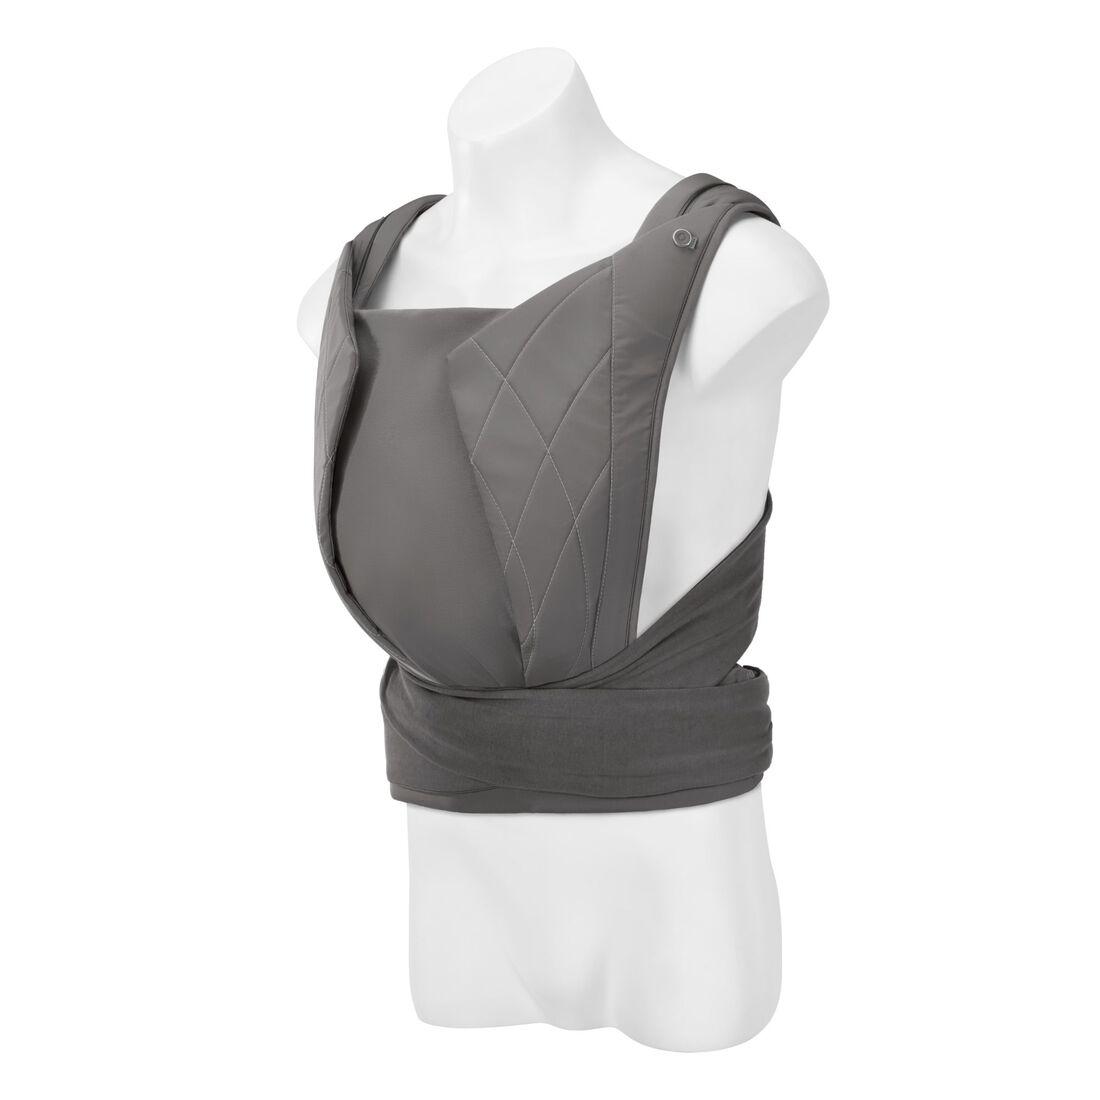 CYBEX Yema Tie - Soho Grey in Soho Grey large Bild 2